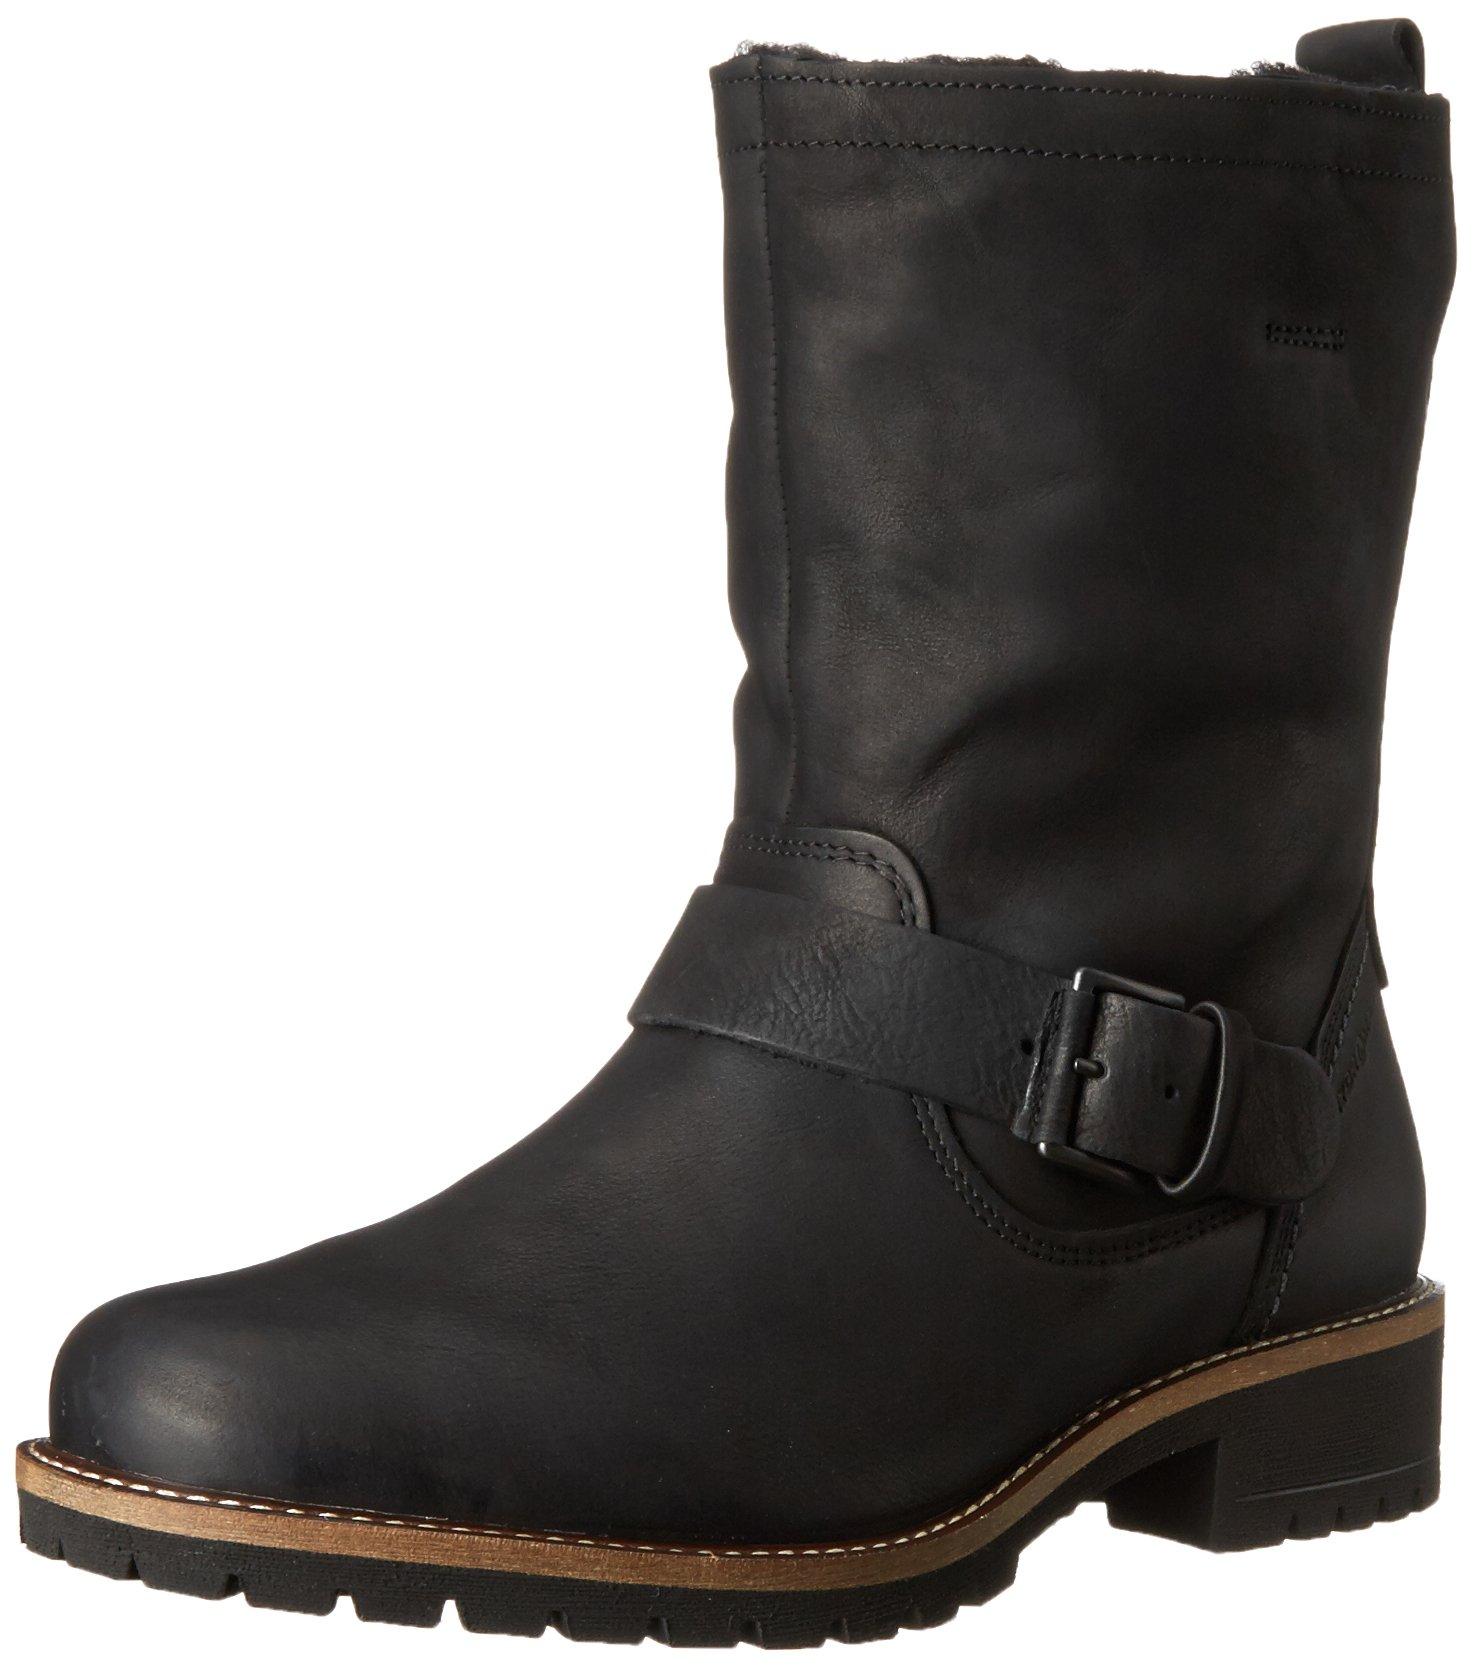 ECCO Footwear Womens Elaine Buckle Boot, Black, 41 EU/10-10.5 M US